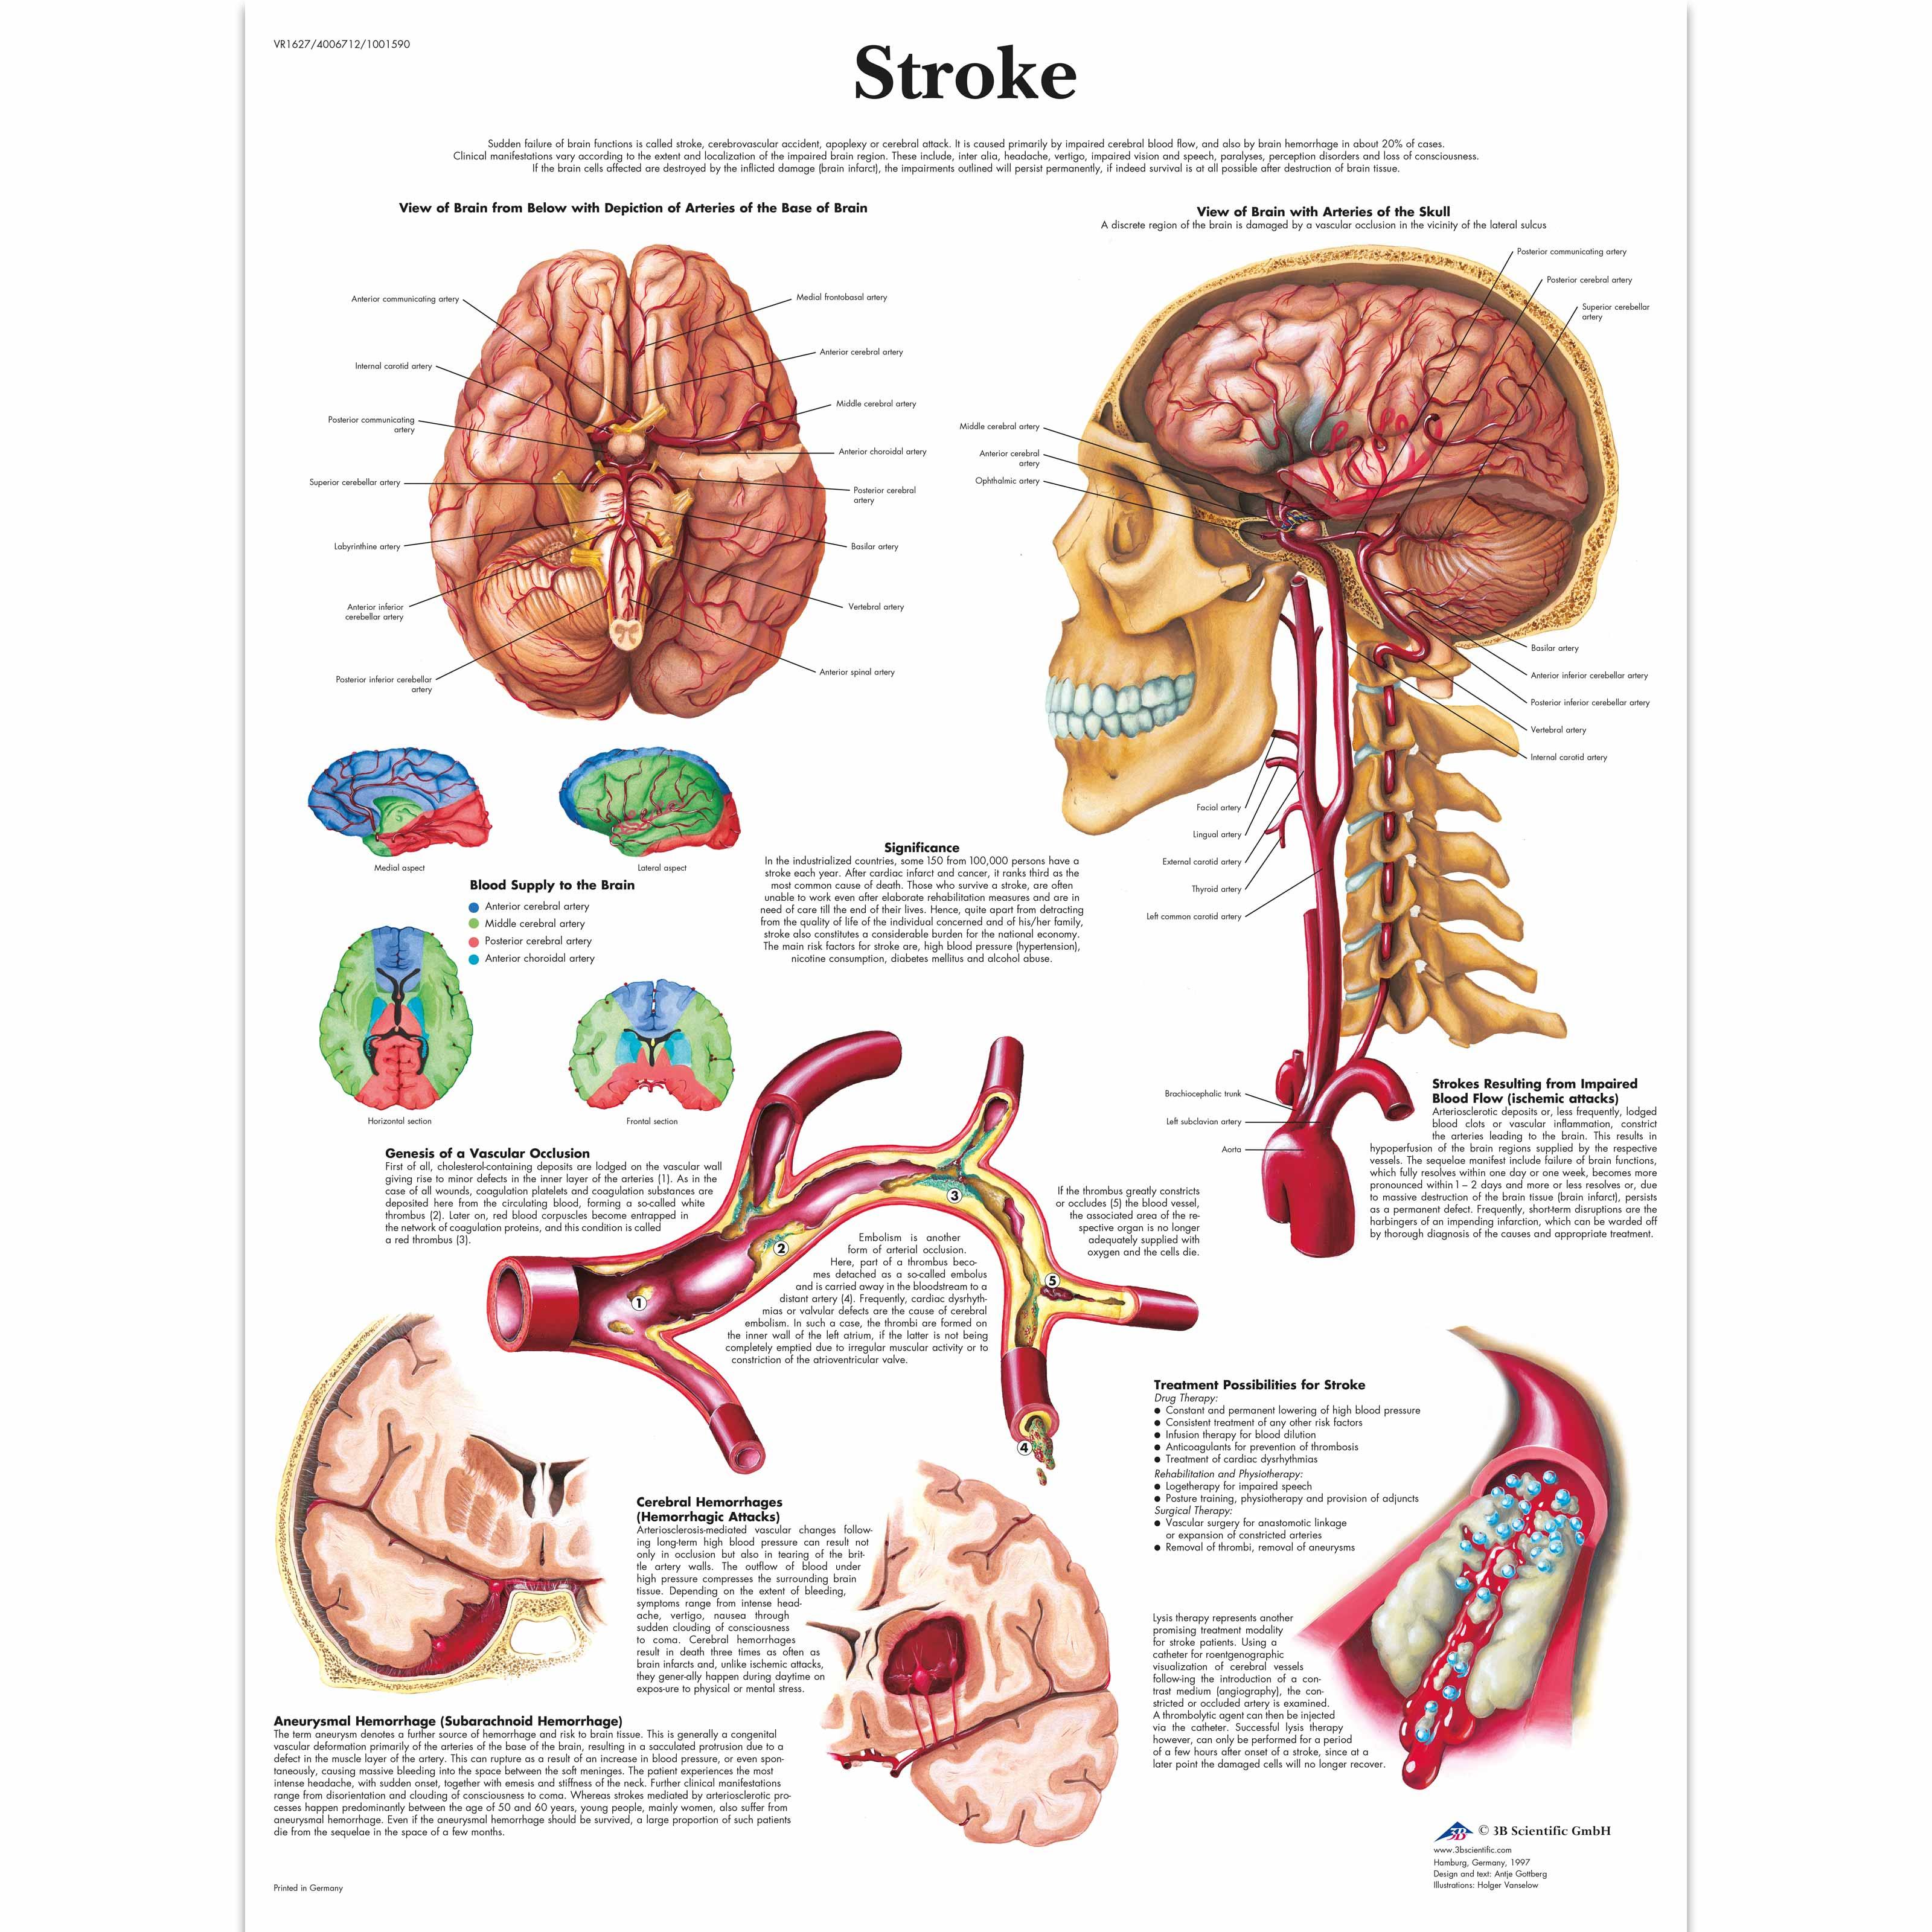 Lehrtafel stroke